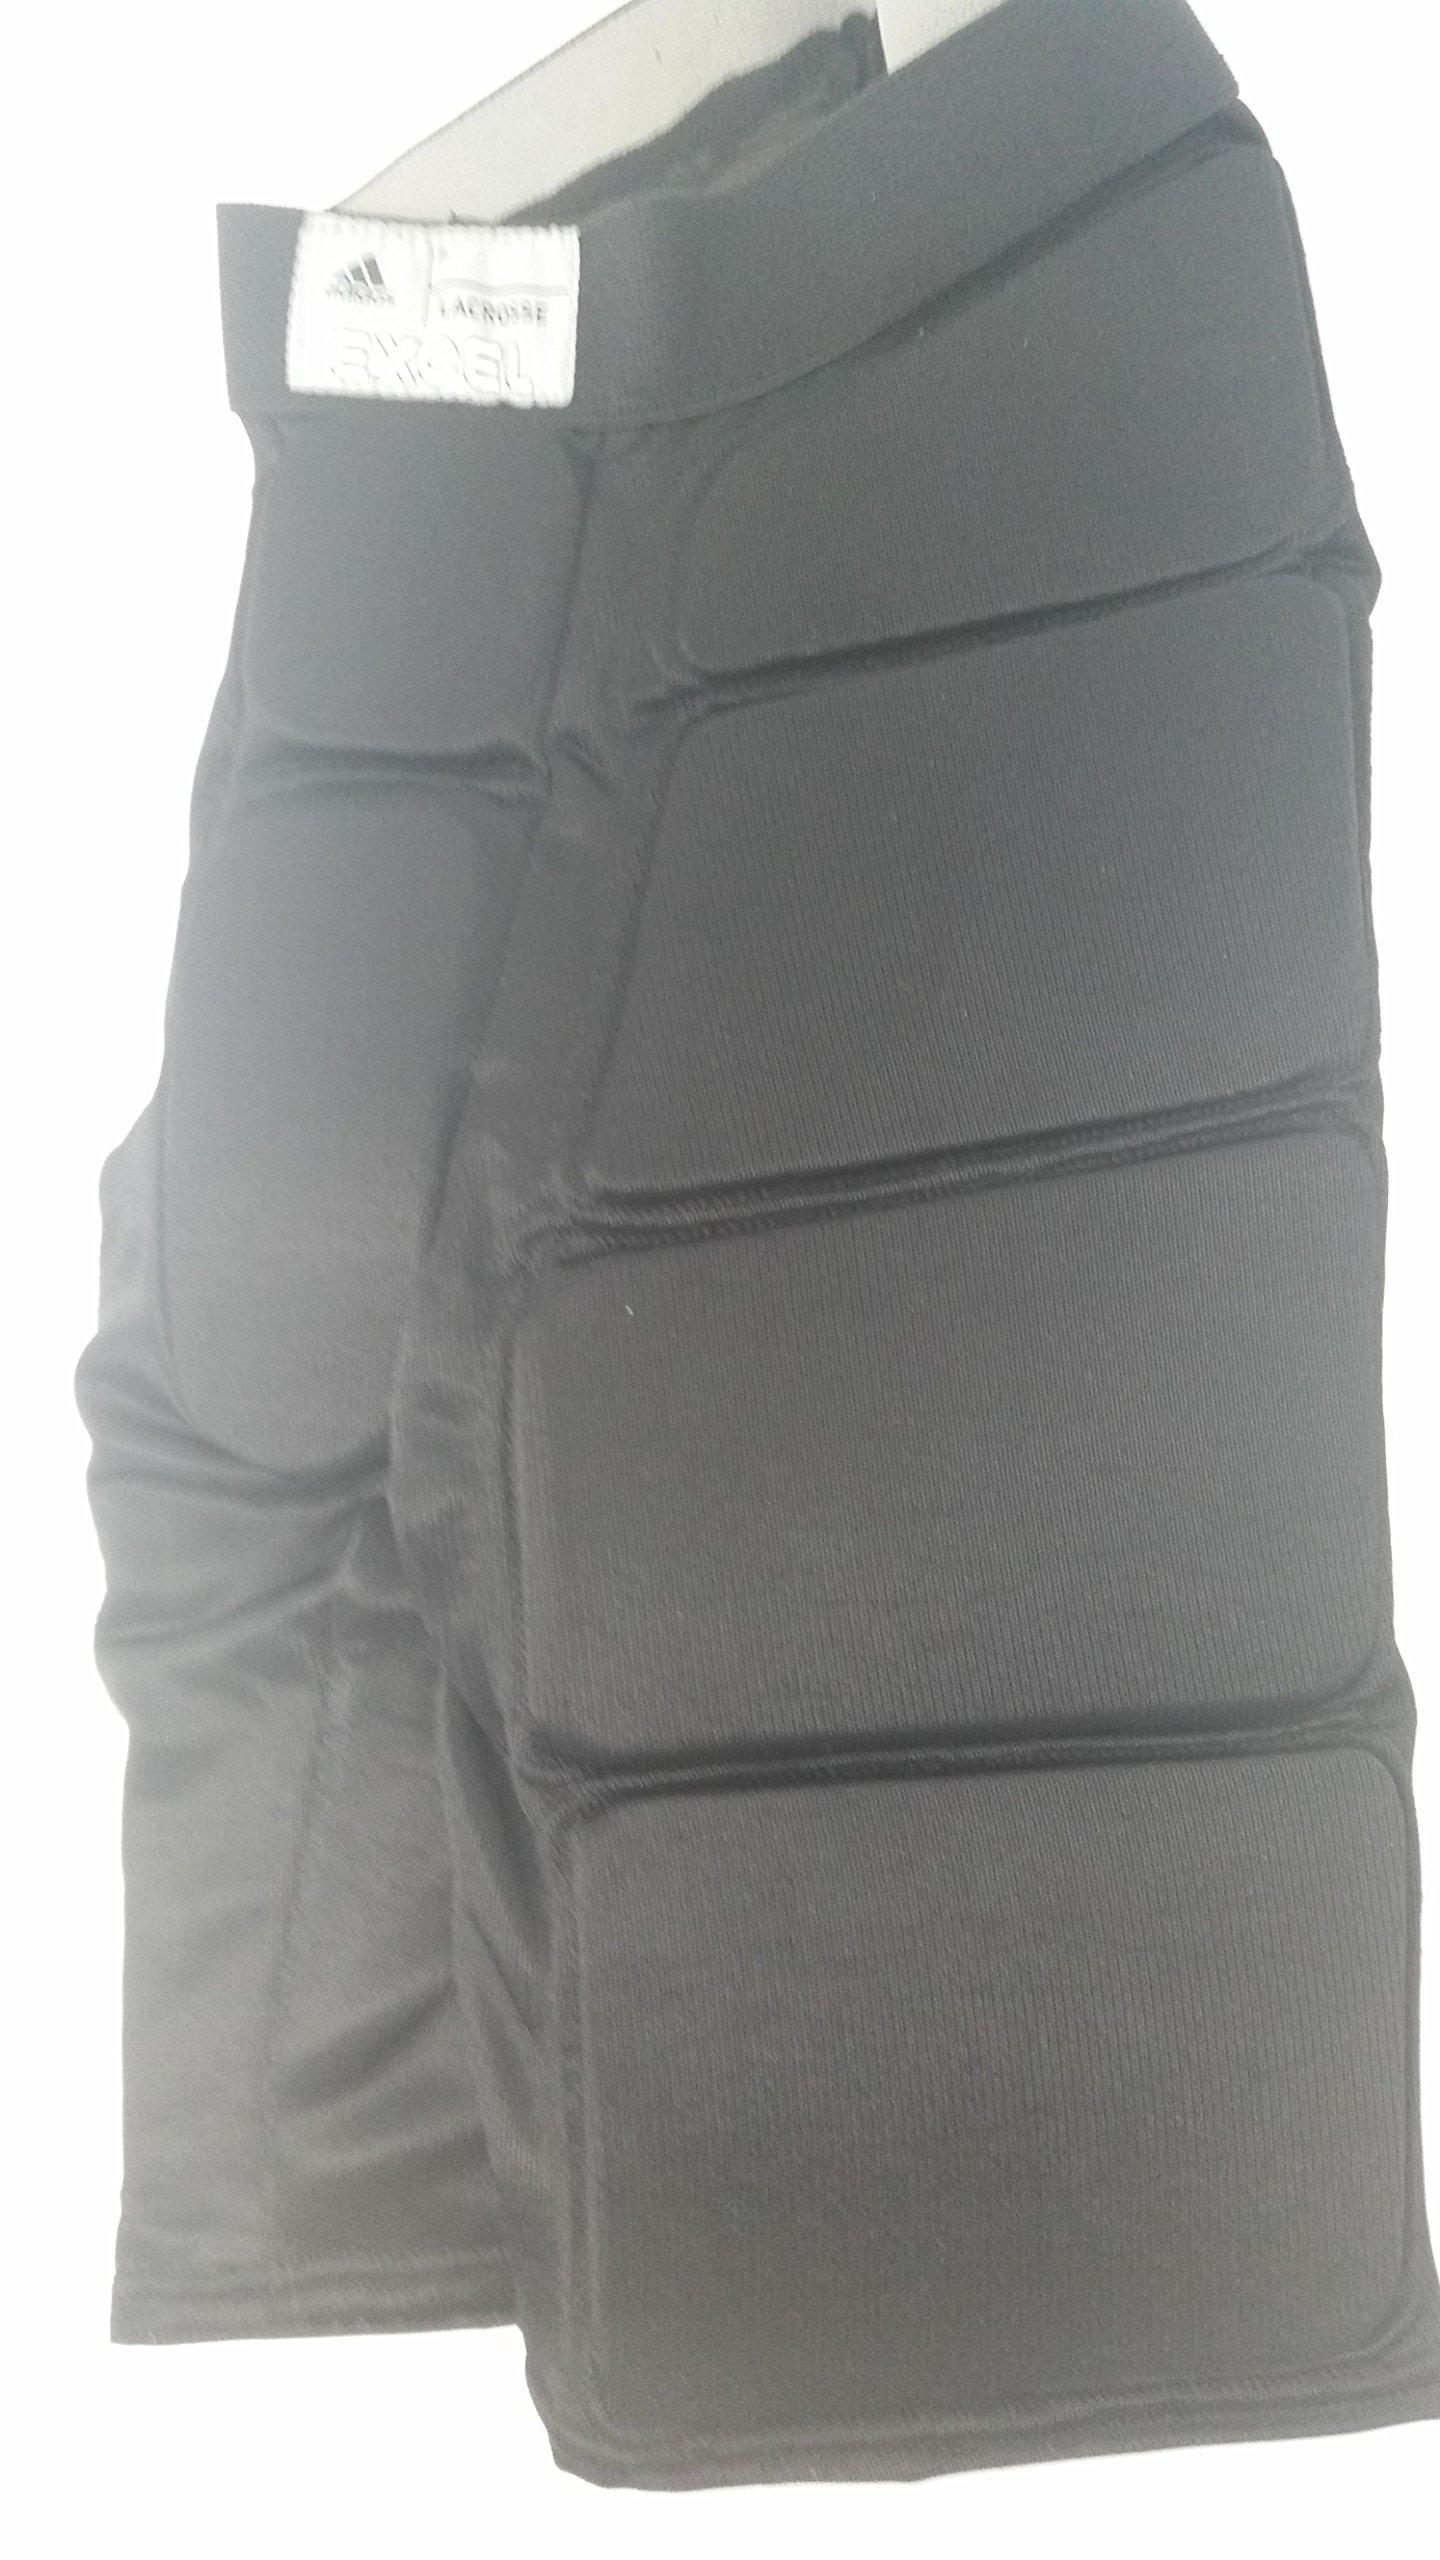 adidas New 7390107 Adult X-Large Black Goalie Protective Pants GP.209 Lacrosse